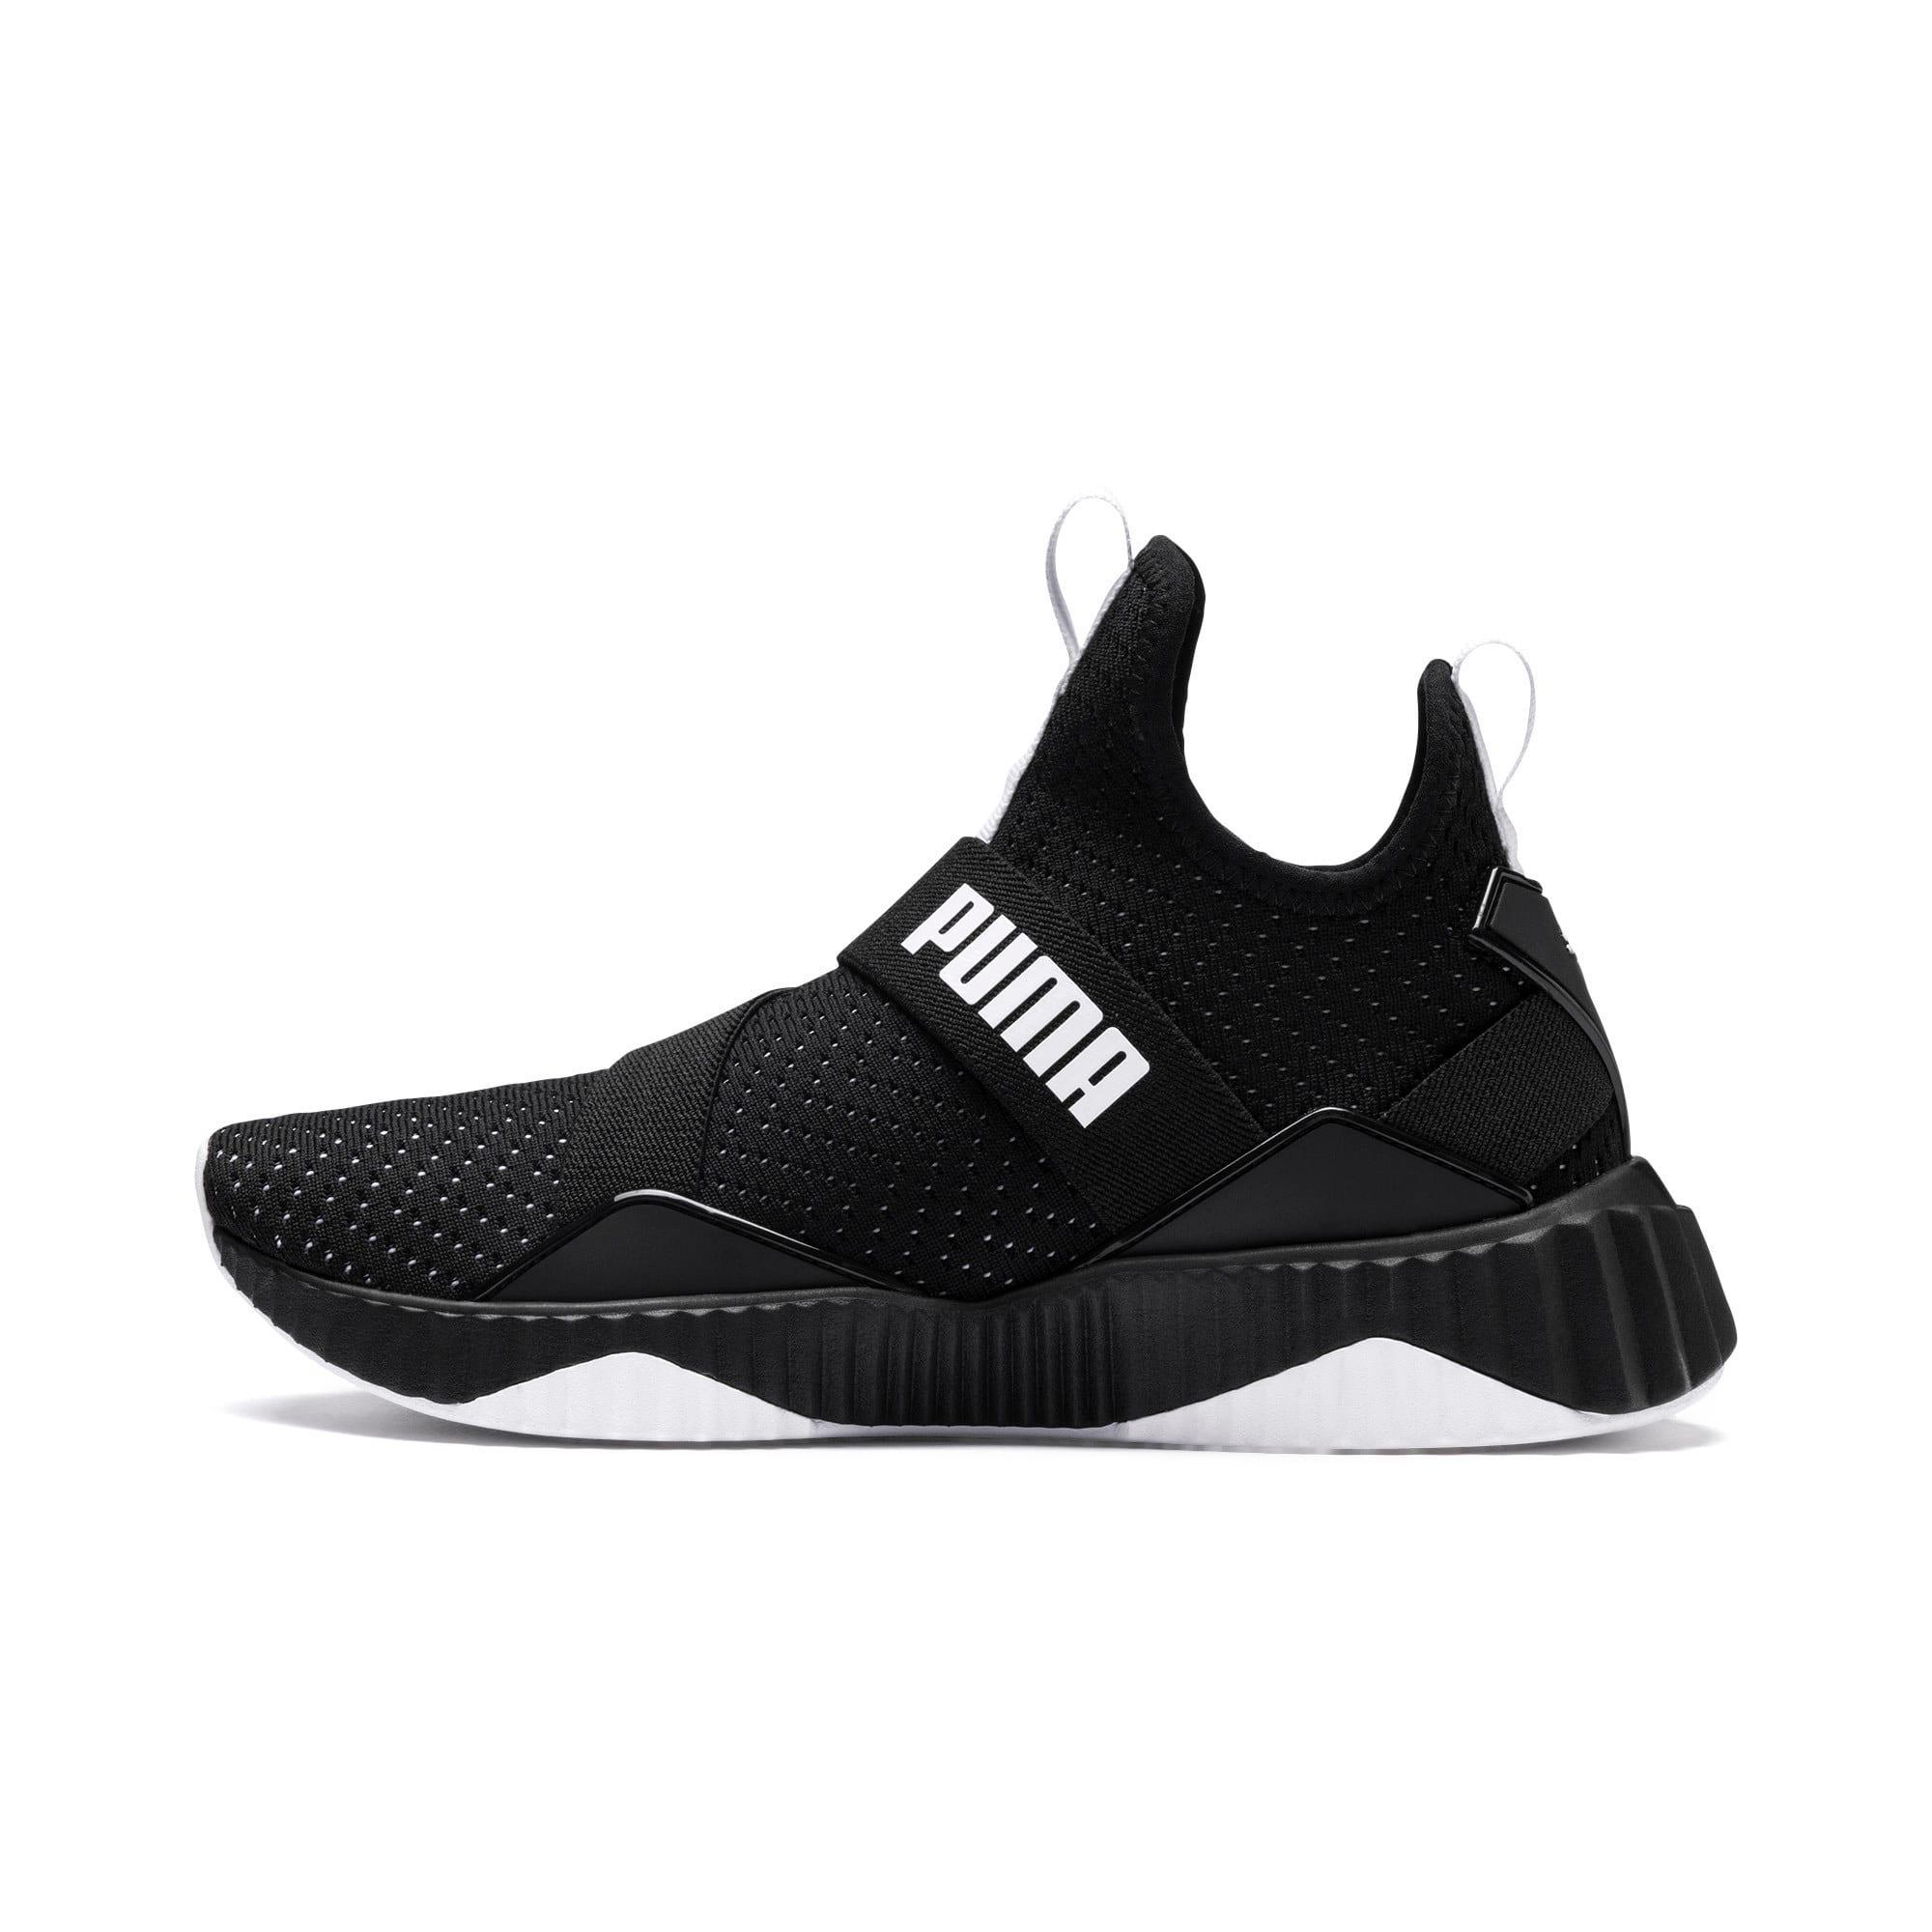 Thumbnail 1 of Defy Mid Core Women's Training Shoes, Puma Black-Puma White, medium